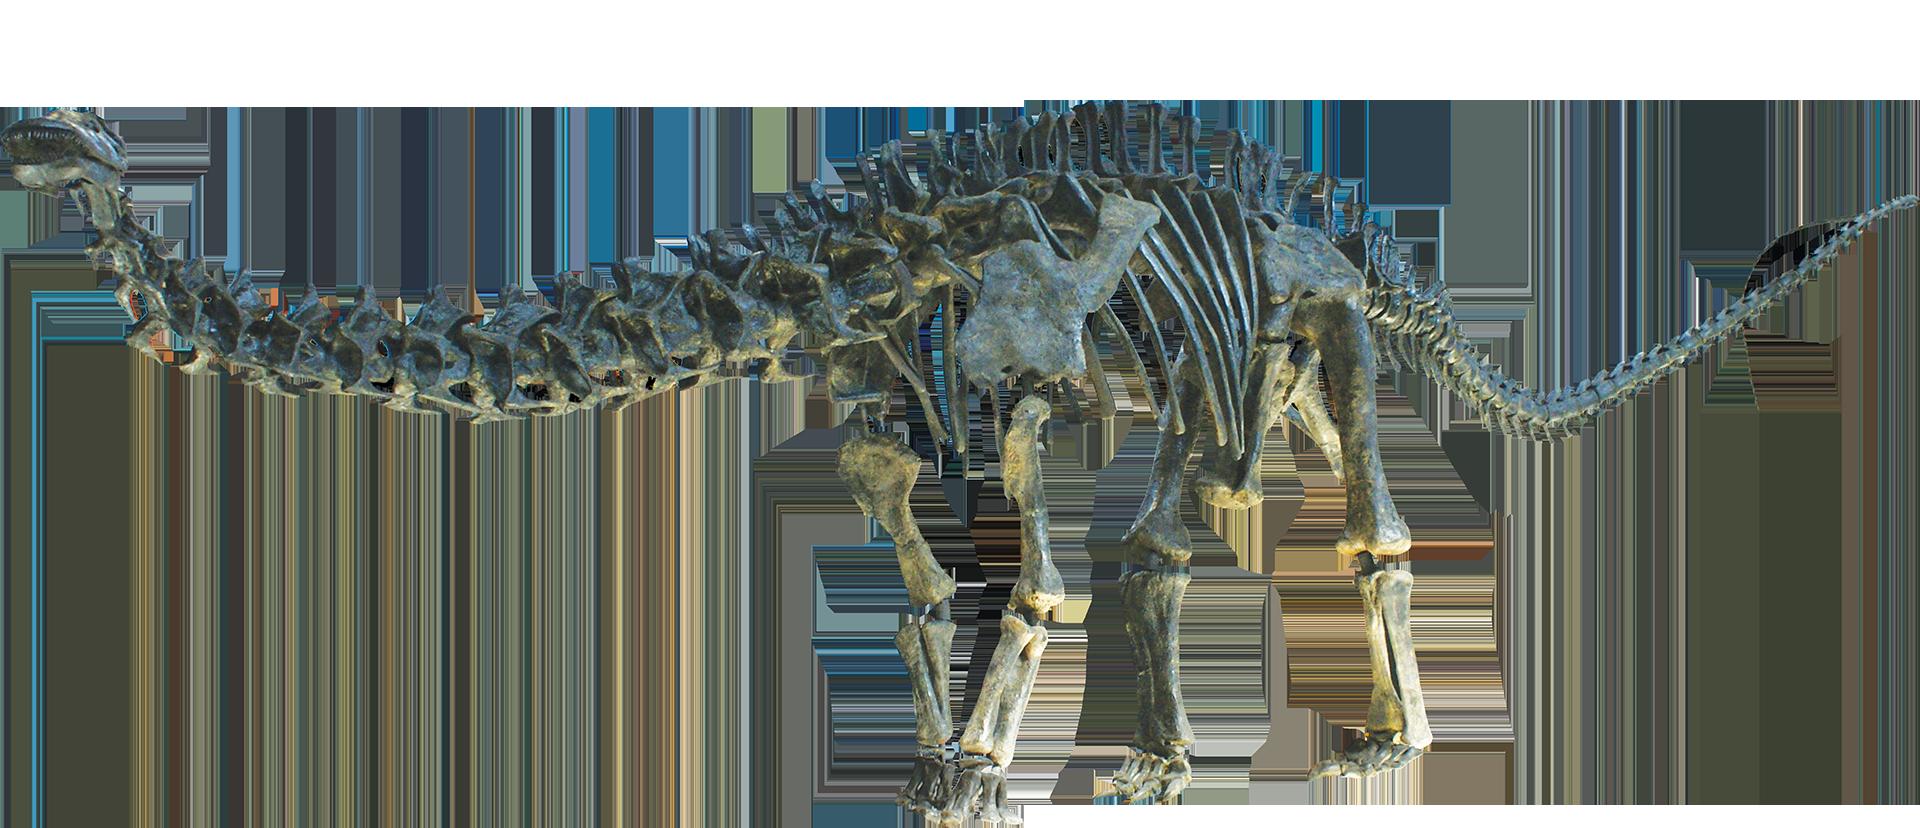 Apatosaurusclean Png 1920 828 Dinosaur Dinosaur Skeleton Paleontology